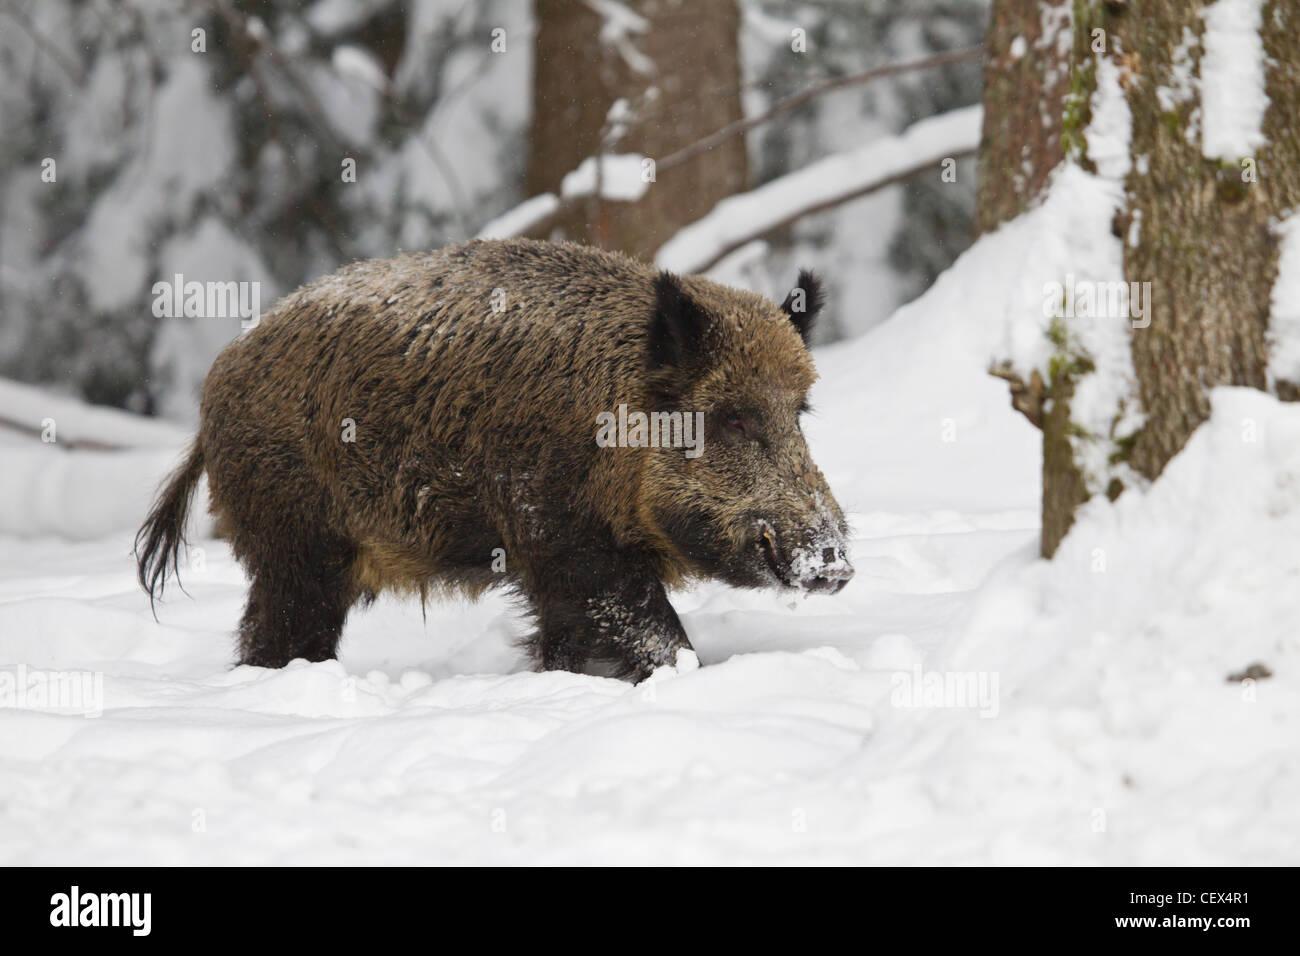 Wildschwein, Sus scrofa, wild boar - Stock Image